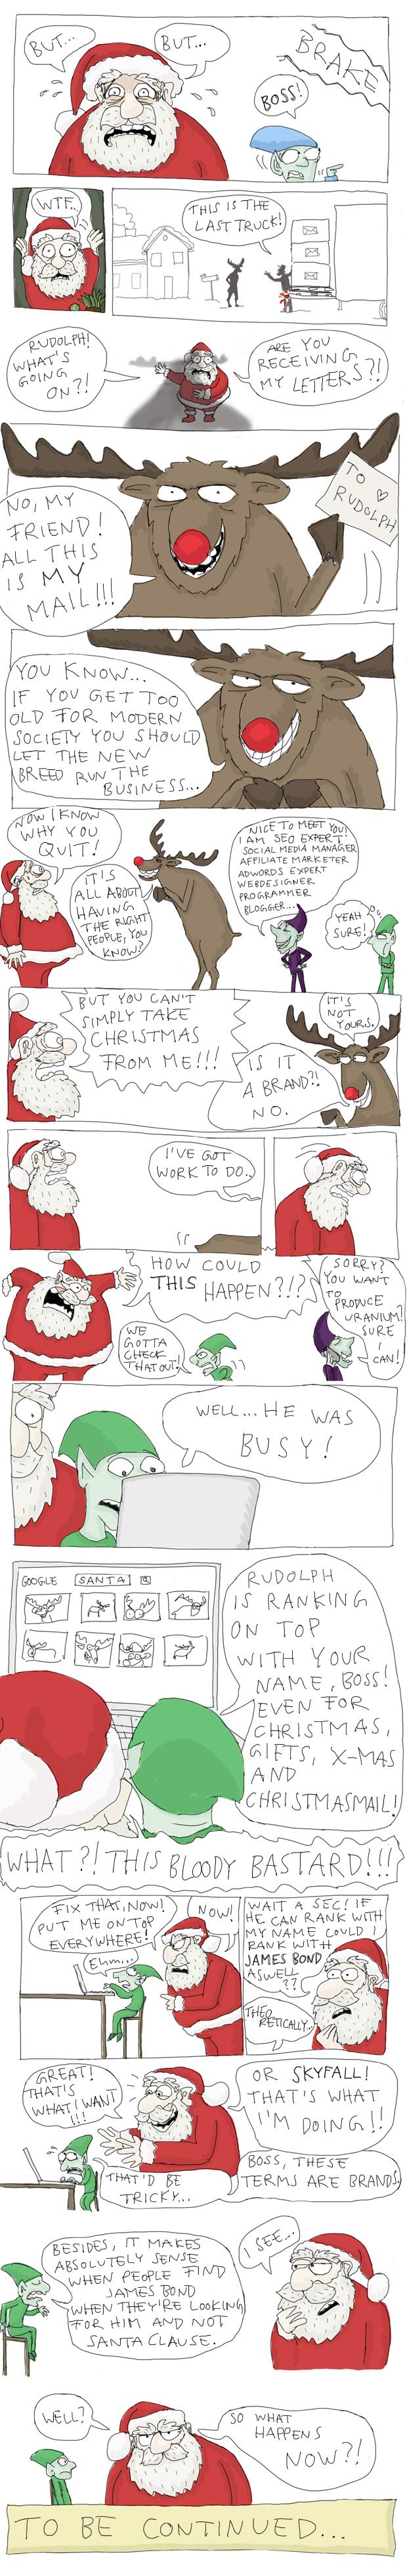 Santa and the Googlebots - by Tobias Kerstin